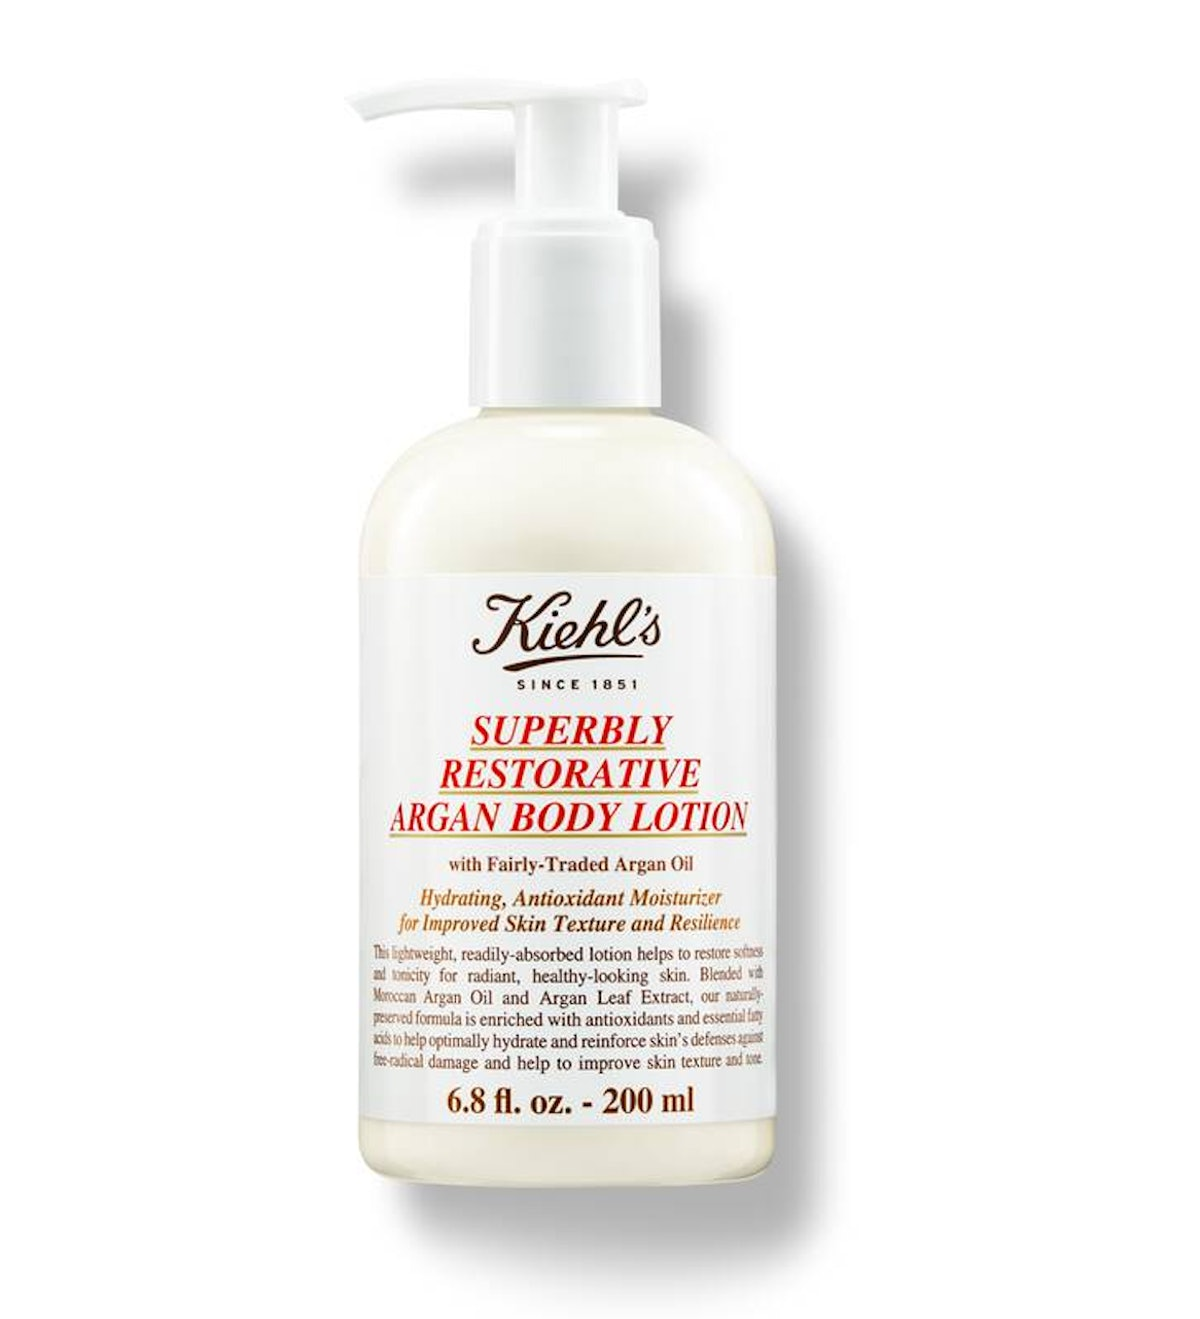 Kiehl's Superbly Restorative Argan Body Lotion All Skin Types